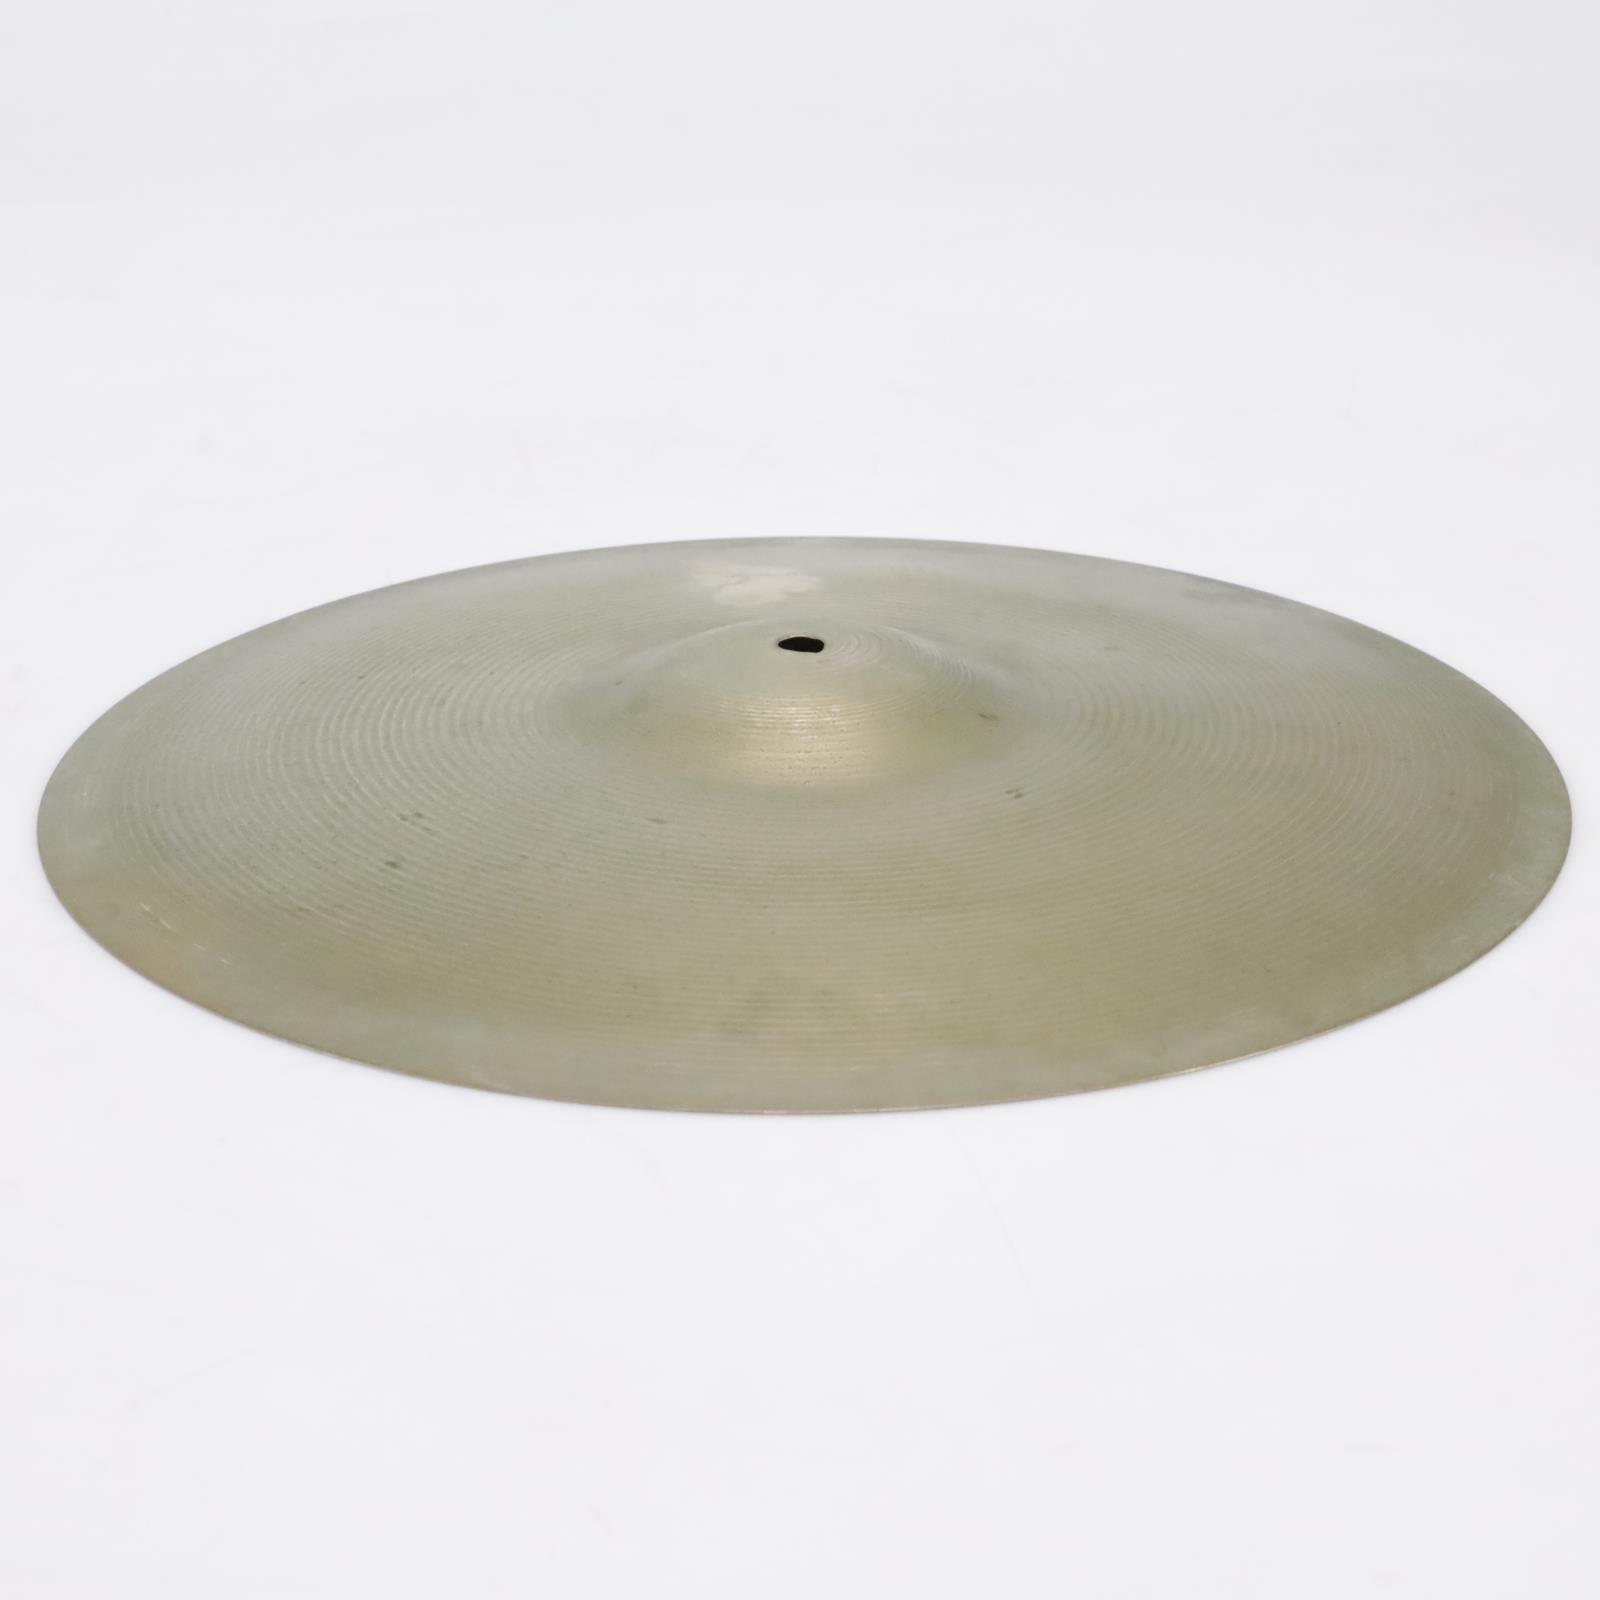 "Vintage Paiste Ludwig Standard 16"" Crash Cymbal Made in Switzerland #43370"